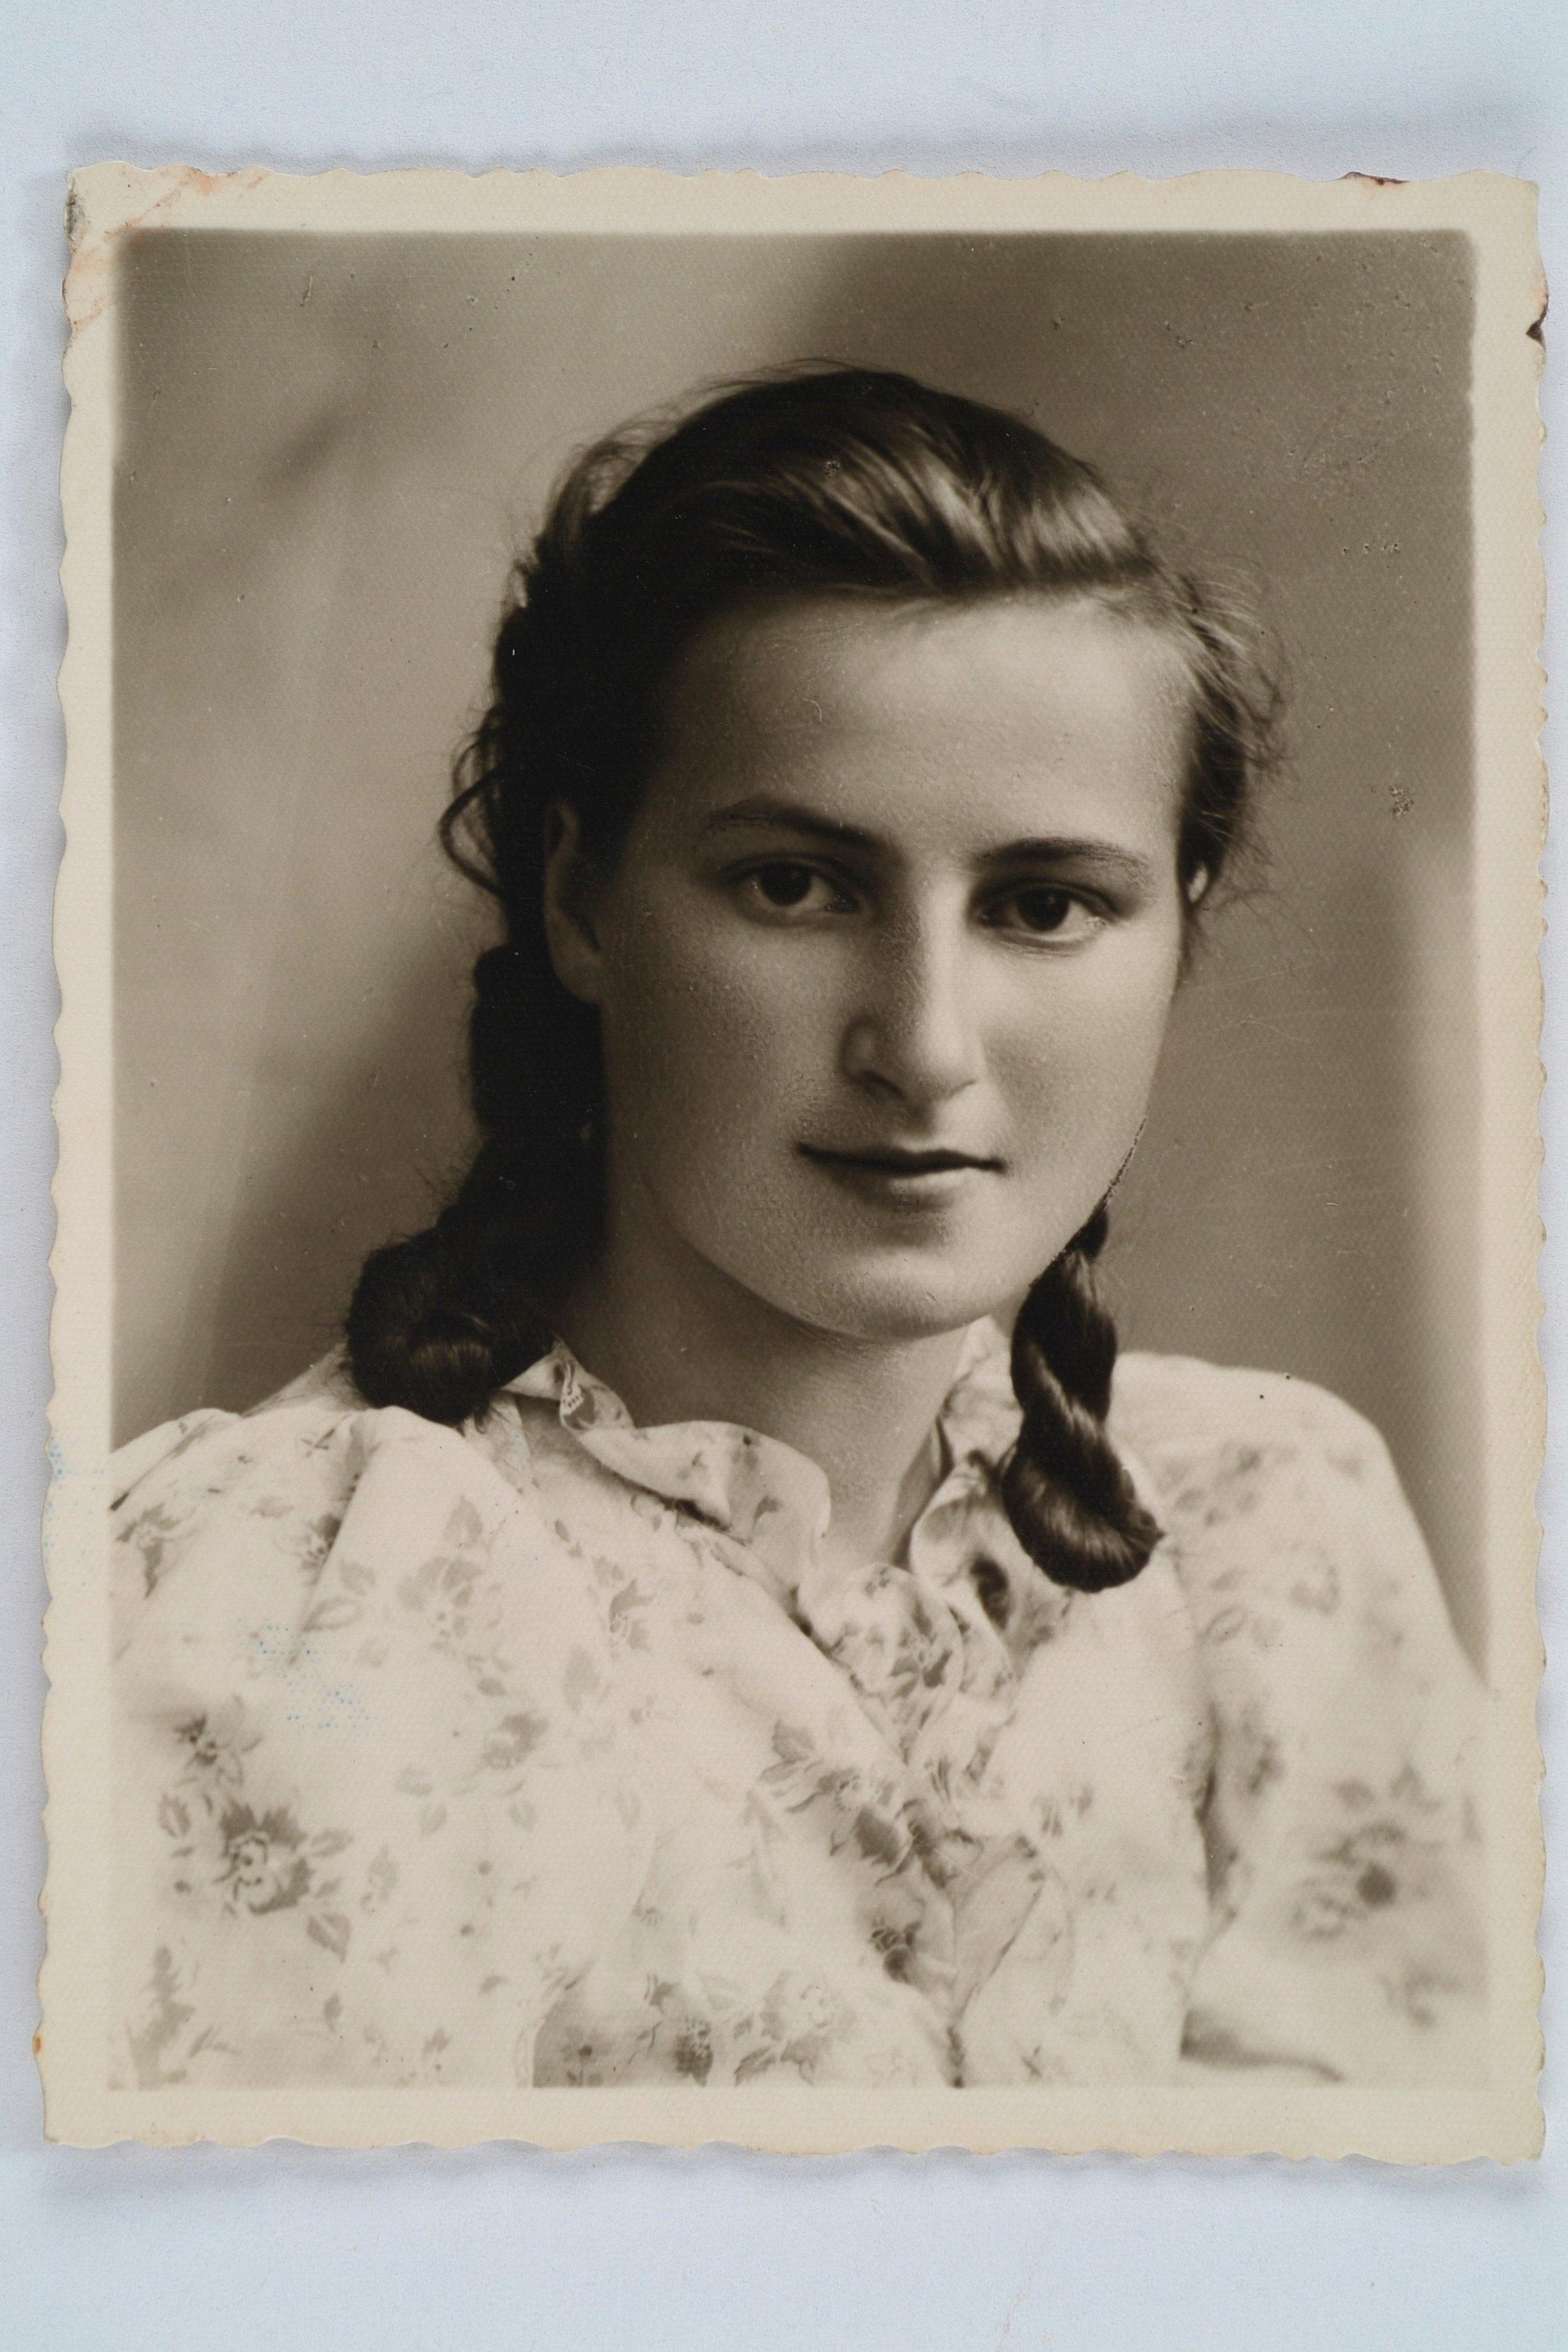 Wanda Poltawska as a young woman